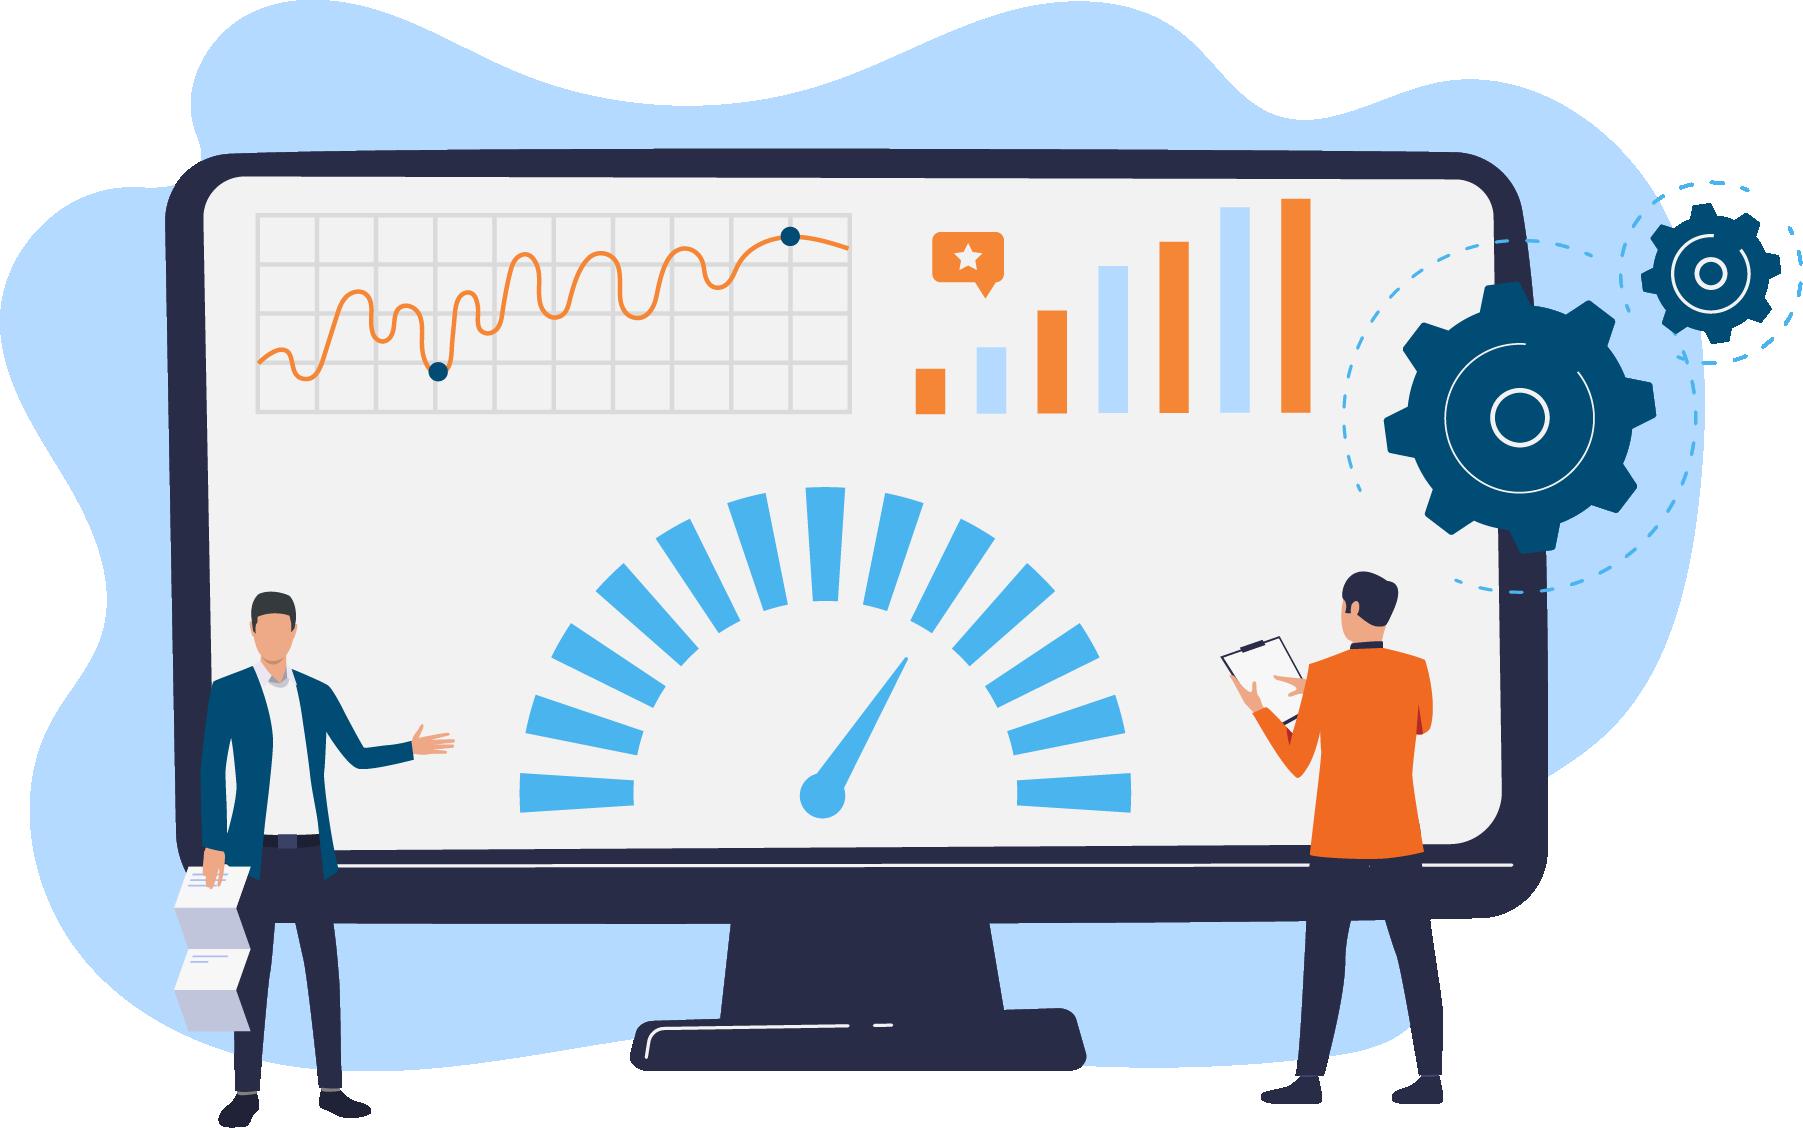 Providing prolonged metrics storage retention